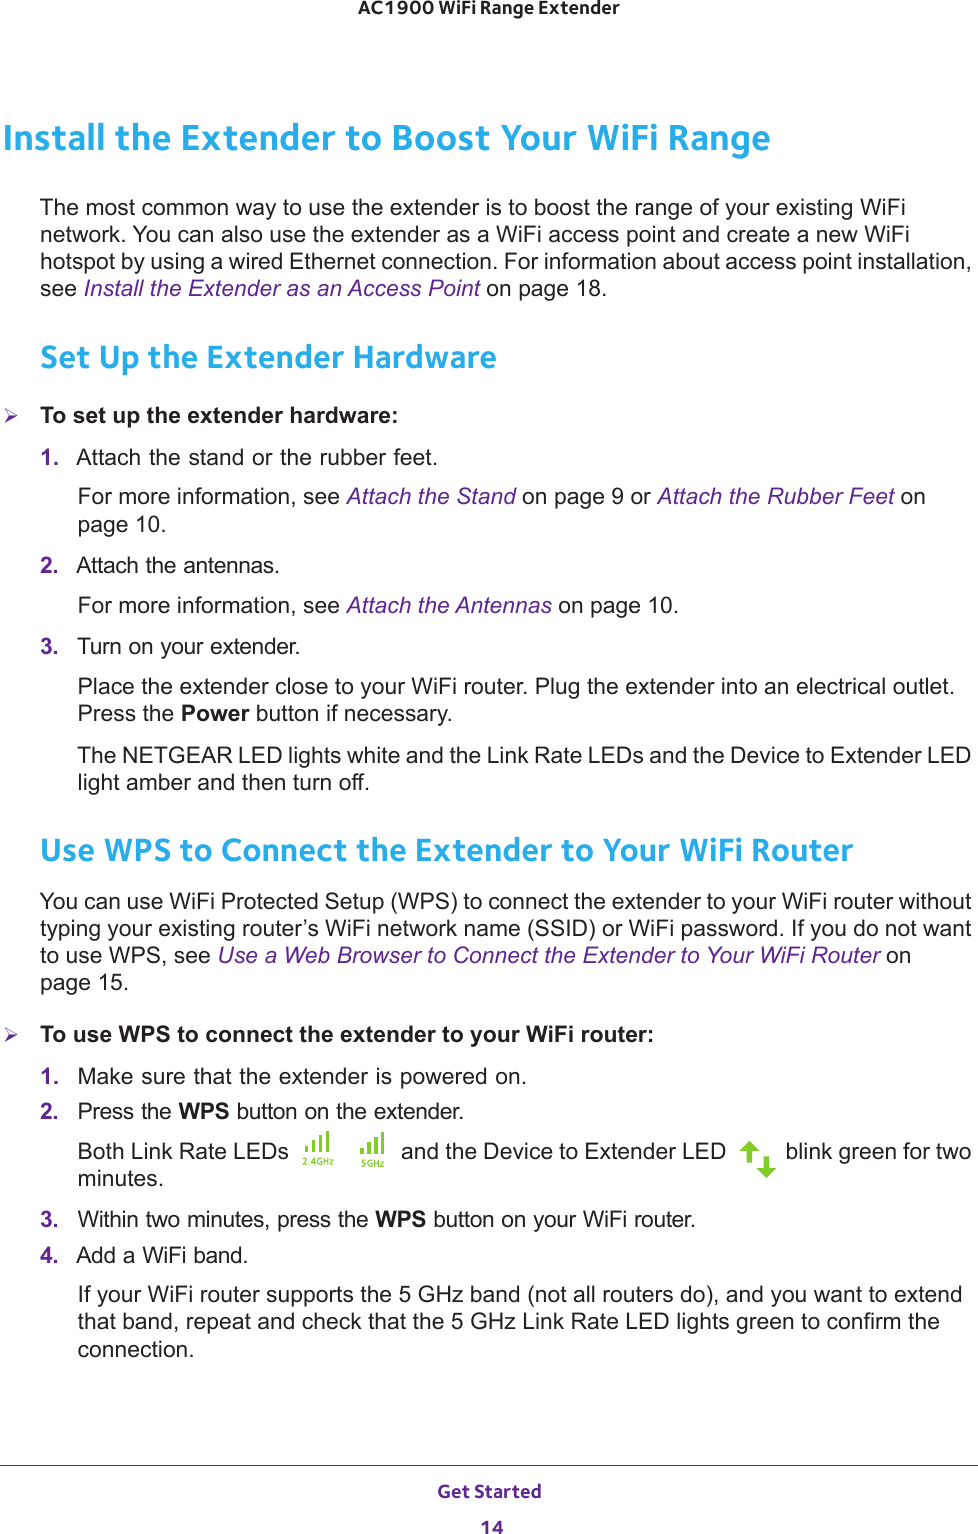 Netgear Ex7000 User Guide Nighthawk AC1900 WiFi Range Extender